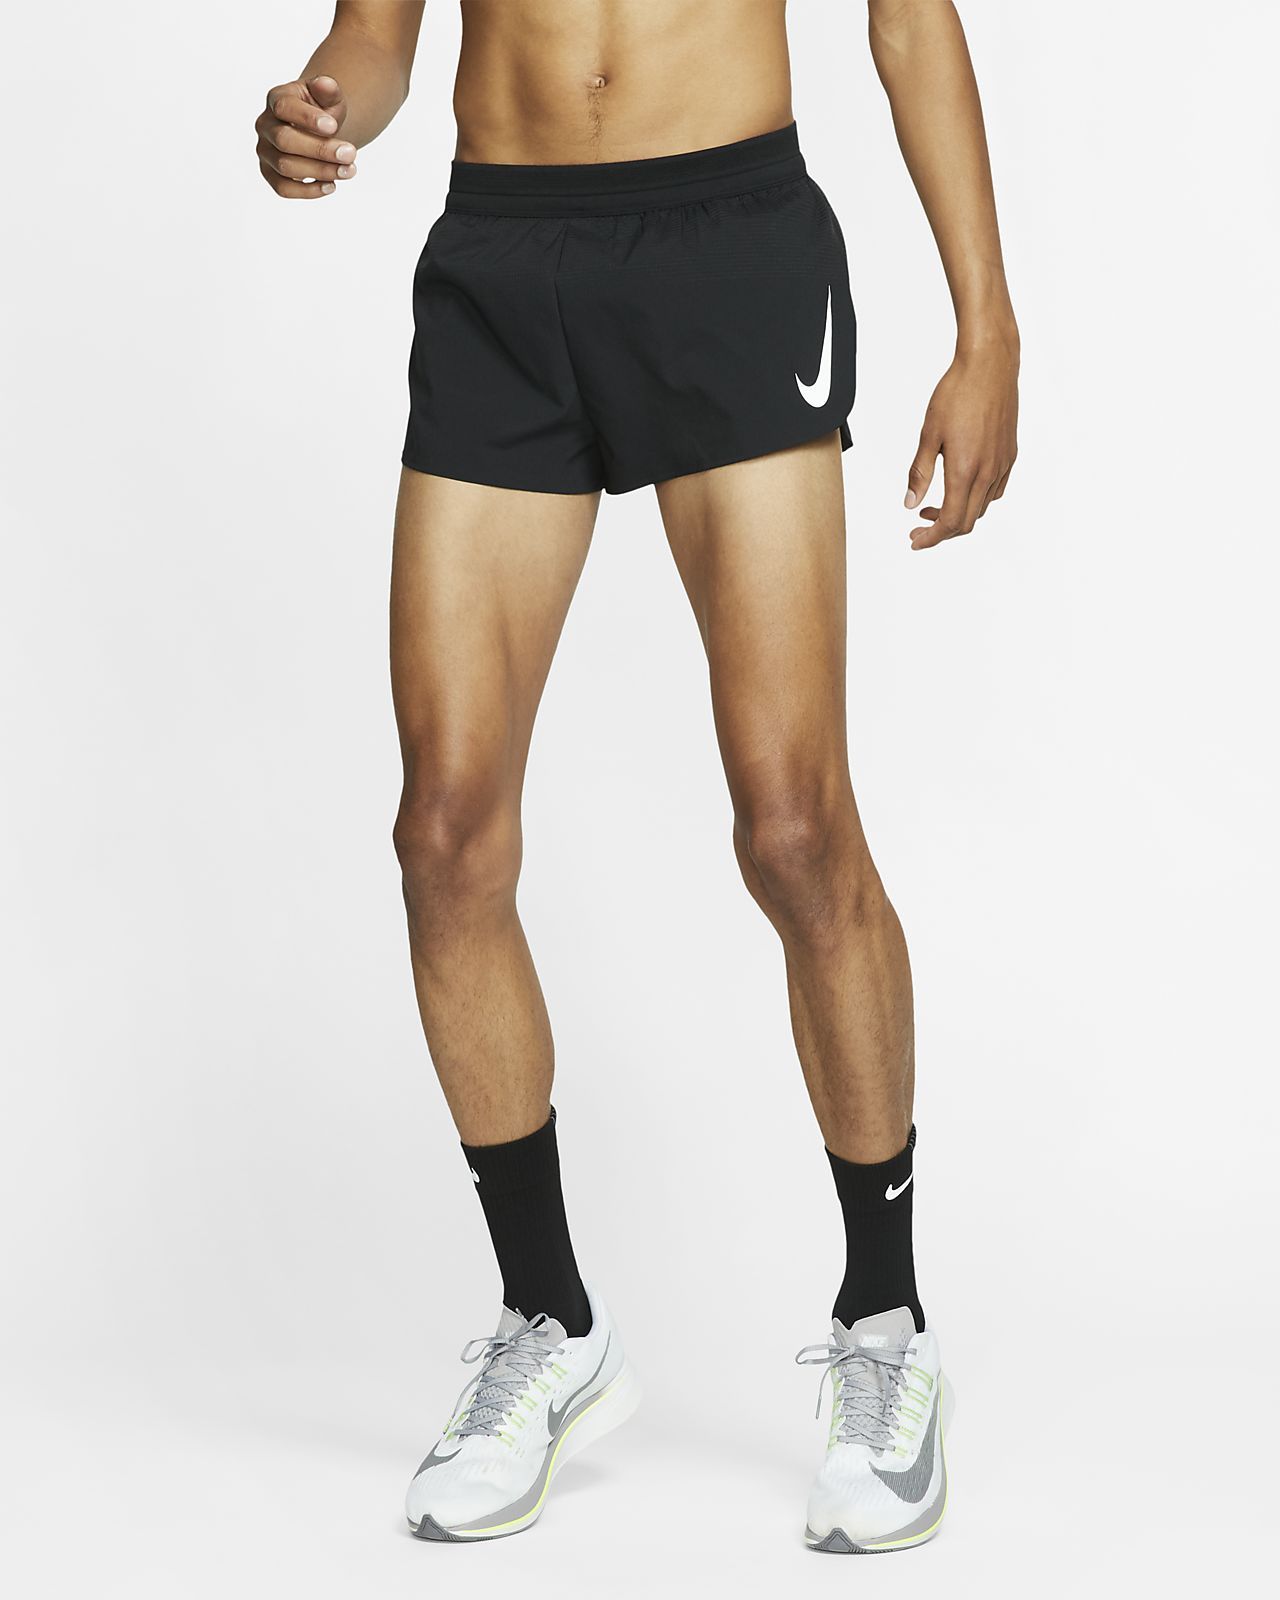 Nike AeroSwift (London) Pantalón corto de running de 5 cm - Hombre